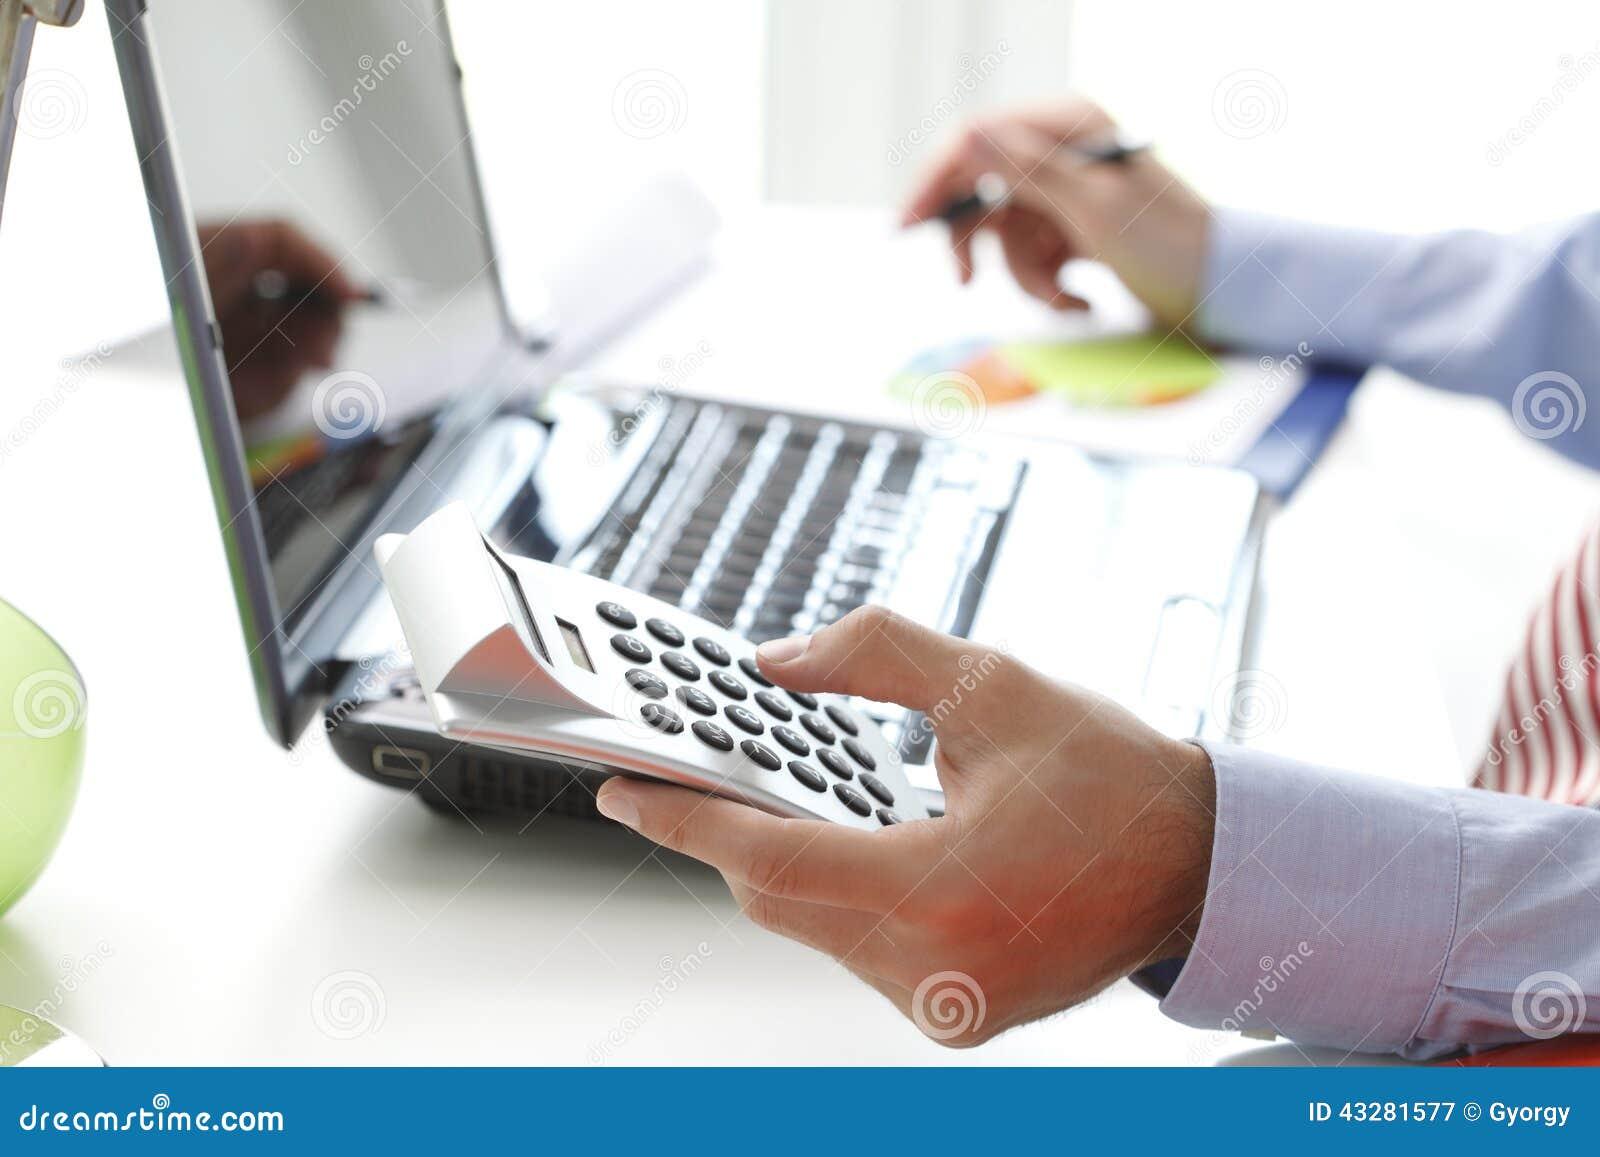 Business financier working at bank